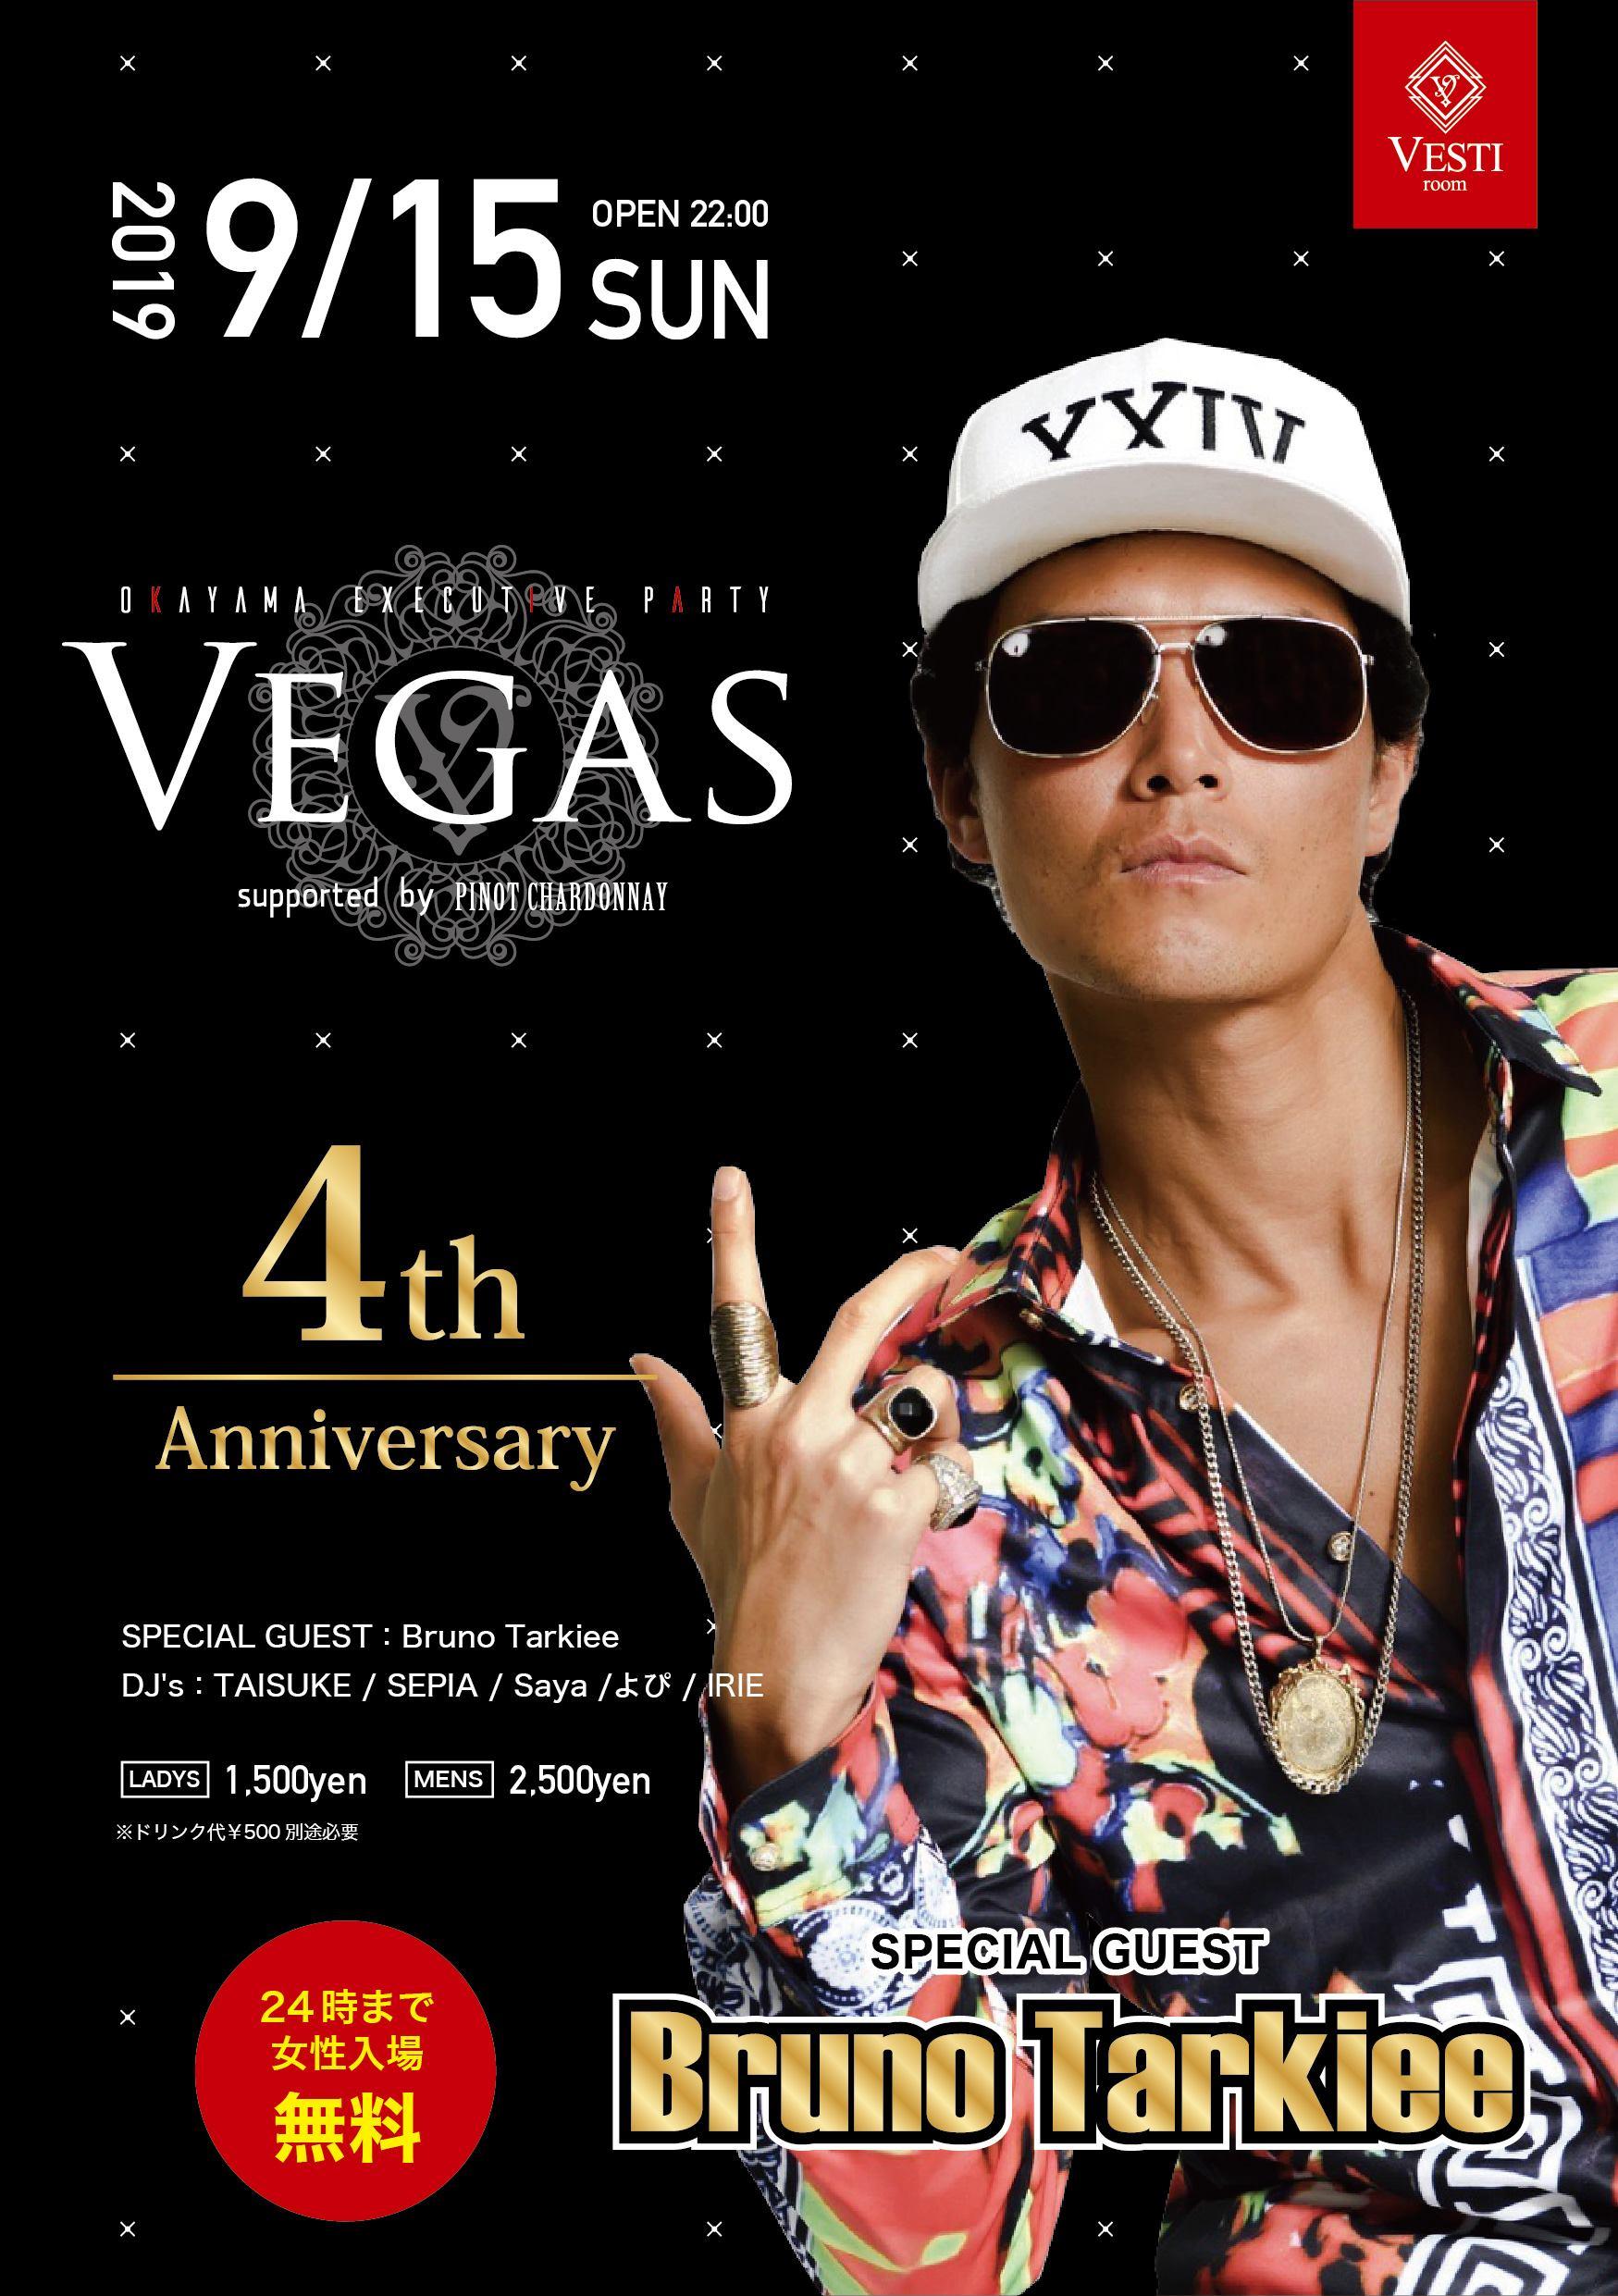 VEGAS 4th Anniversary PT2 ~feat Bruno Tarkiee~